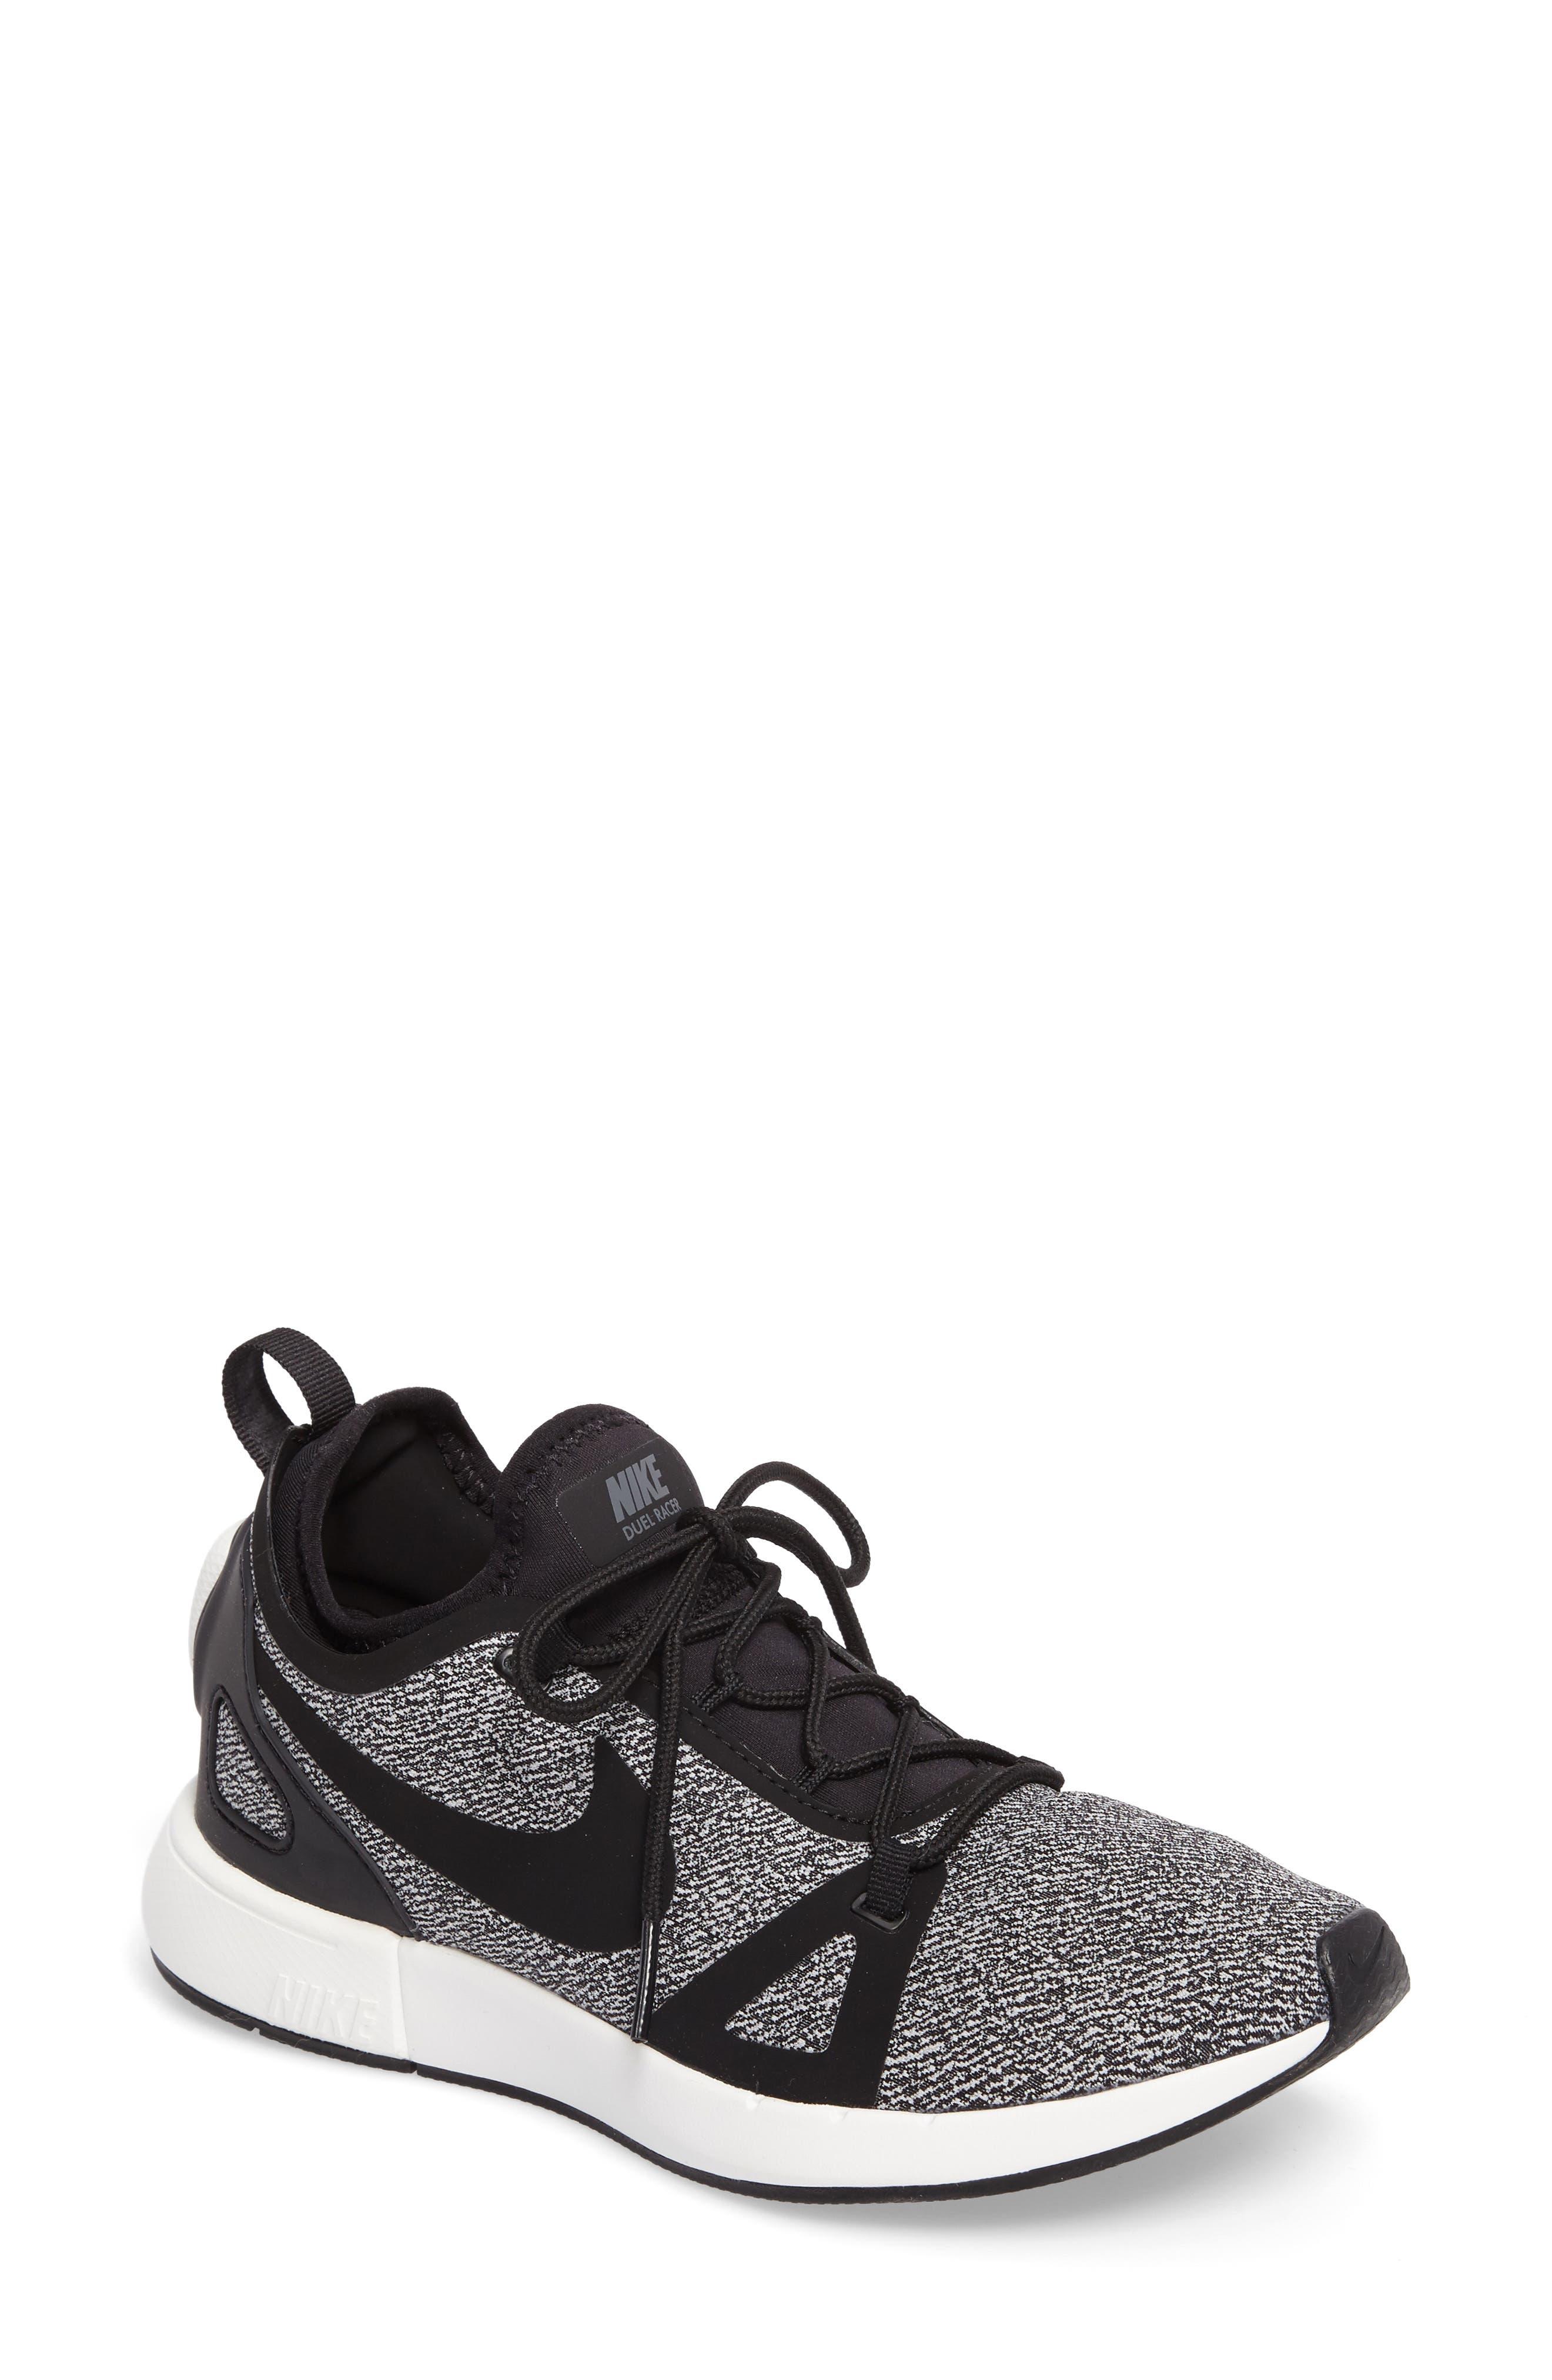 Alternate Image 1 Selected - Nike Duel Racer Knit Sneaker (Women)